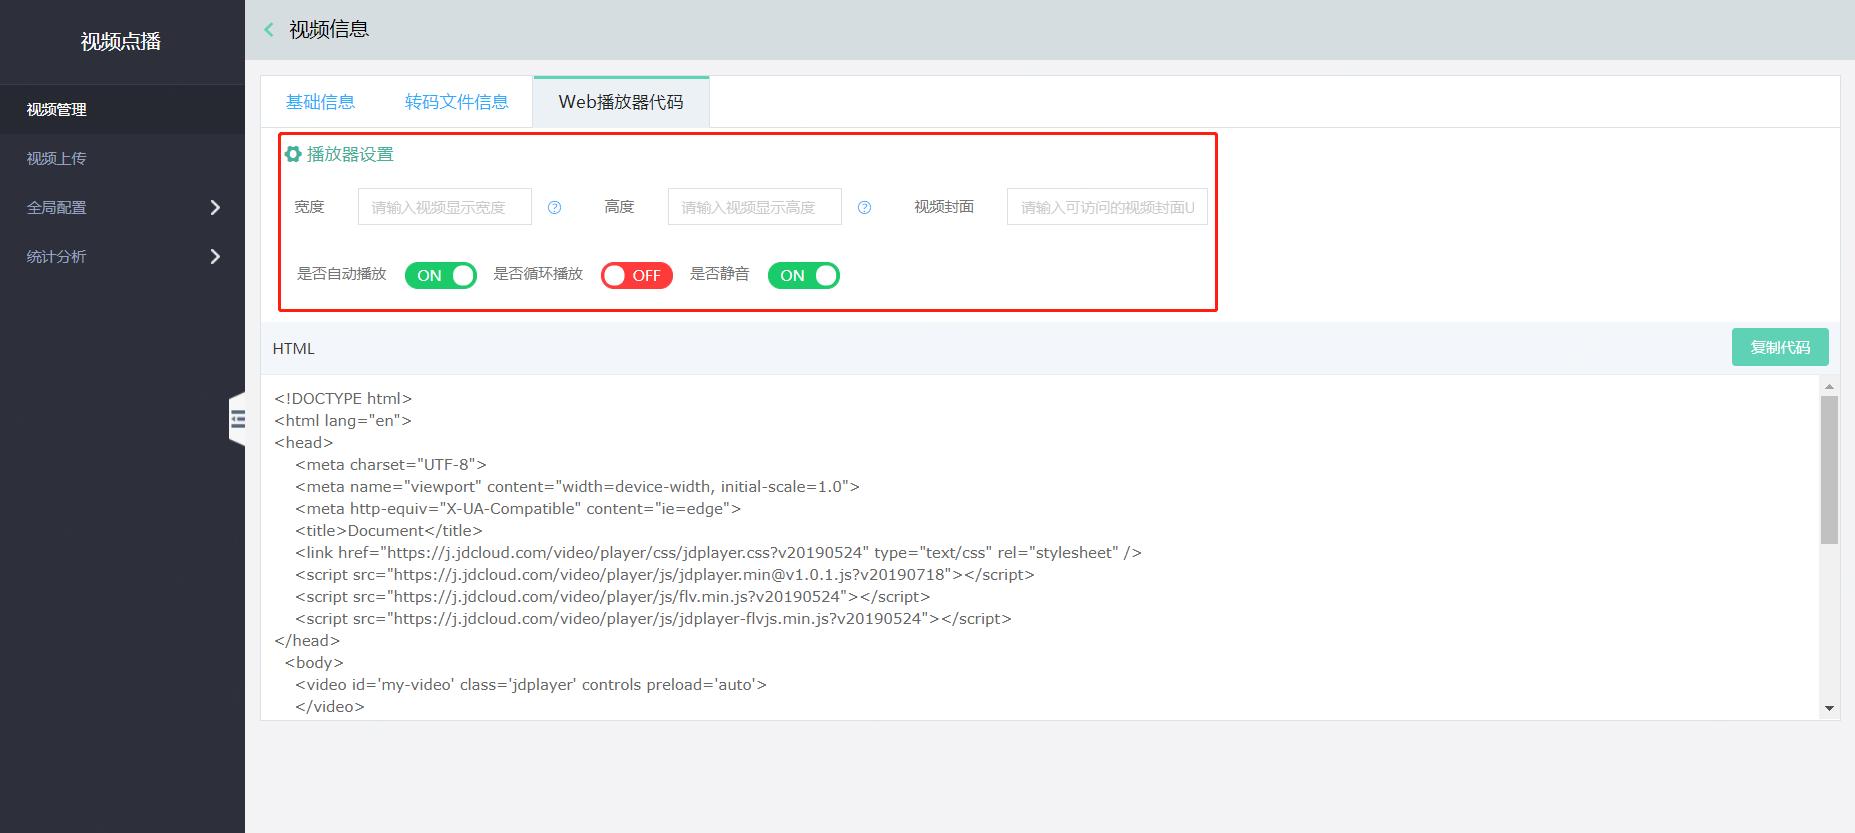 Web播放器图形化参数设置.png